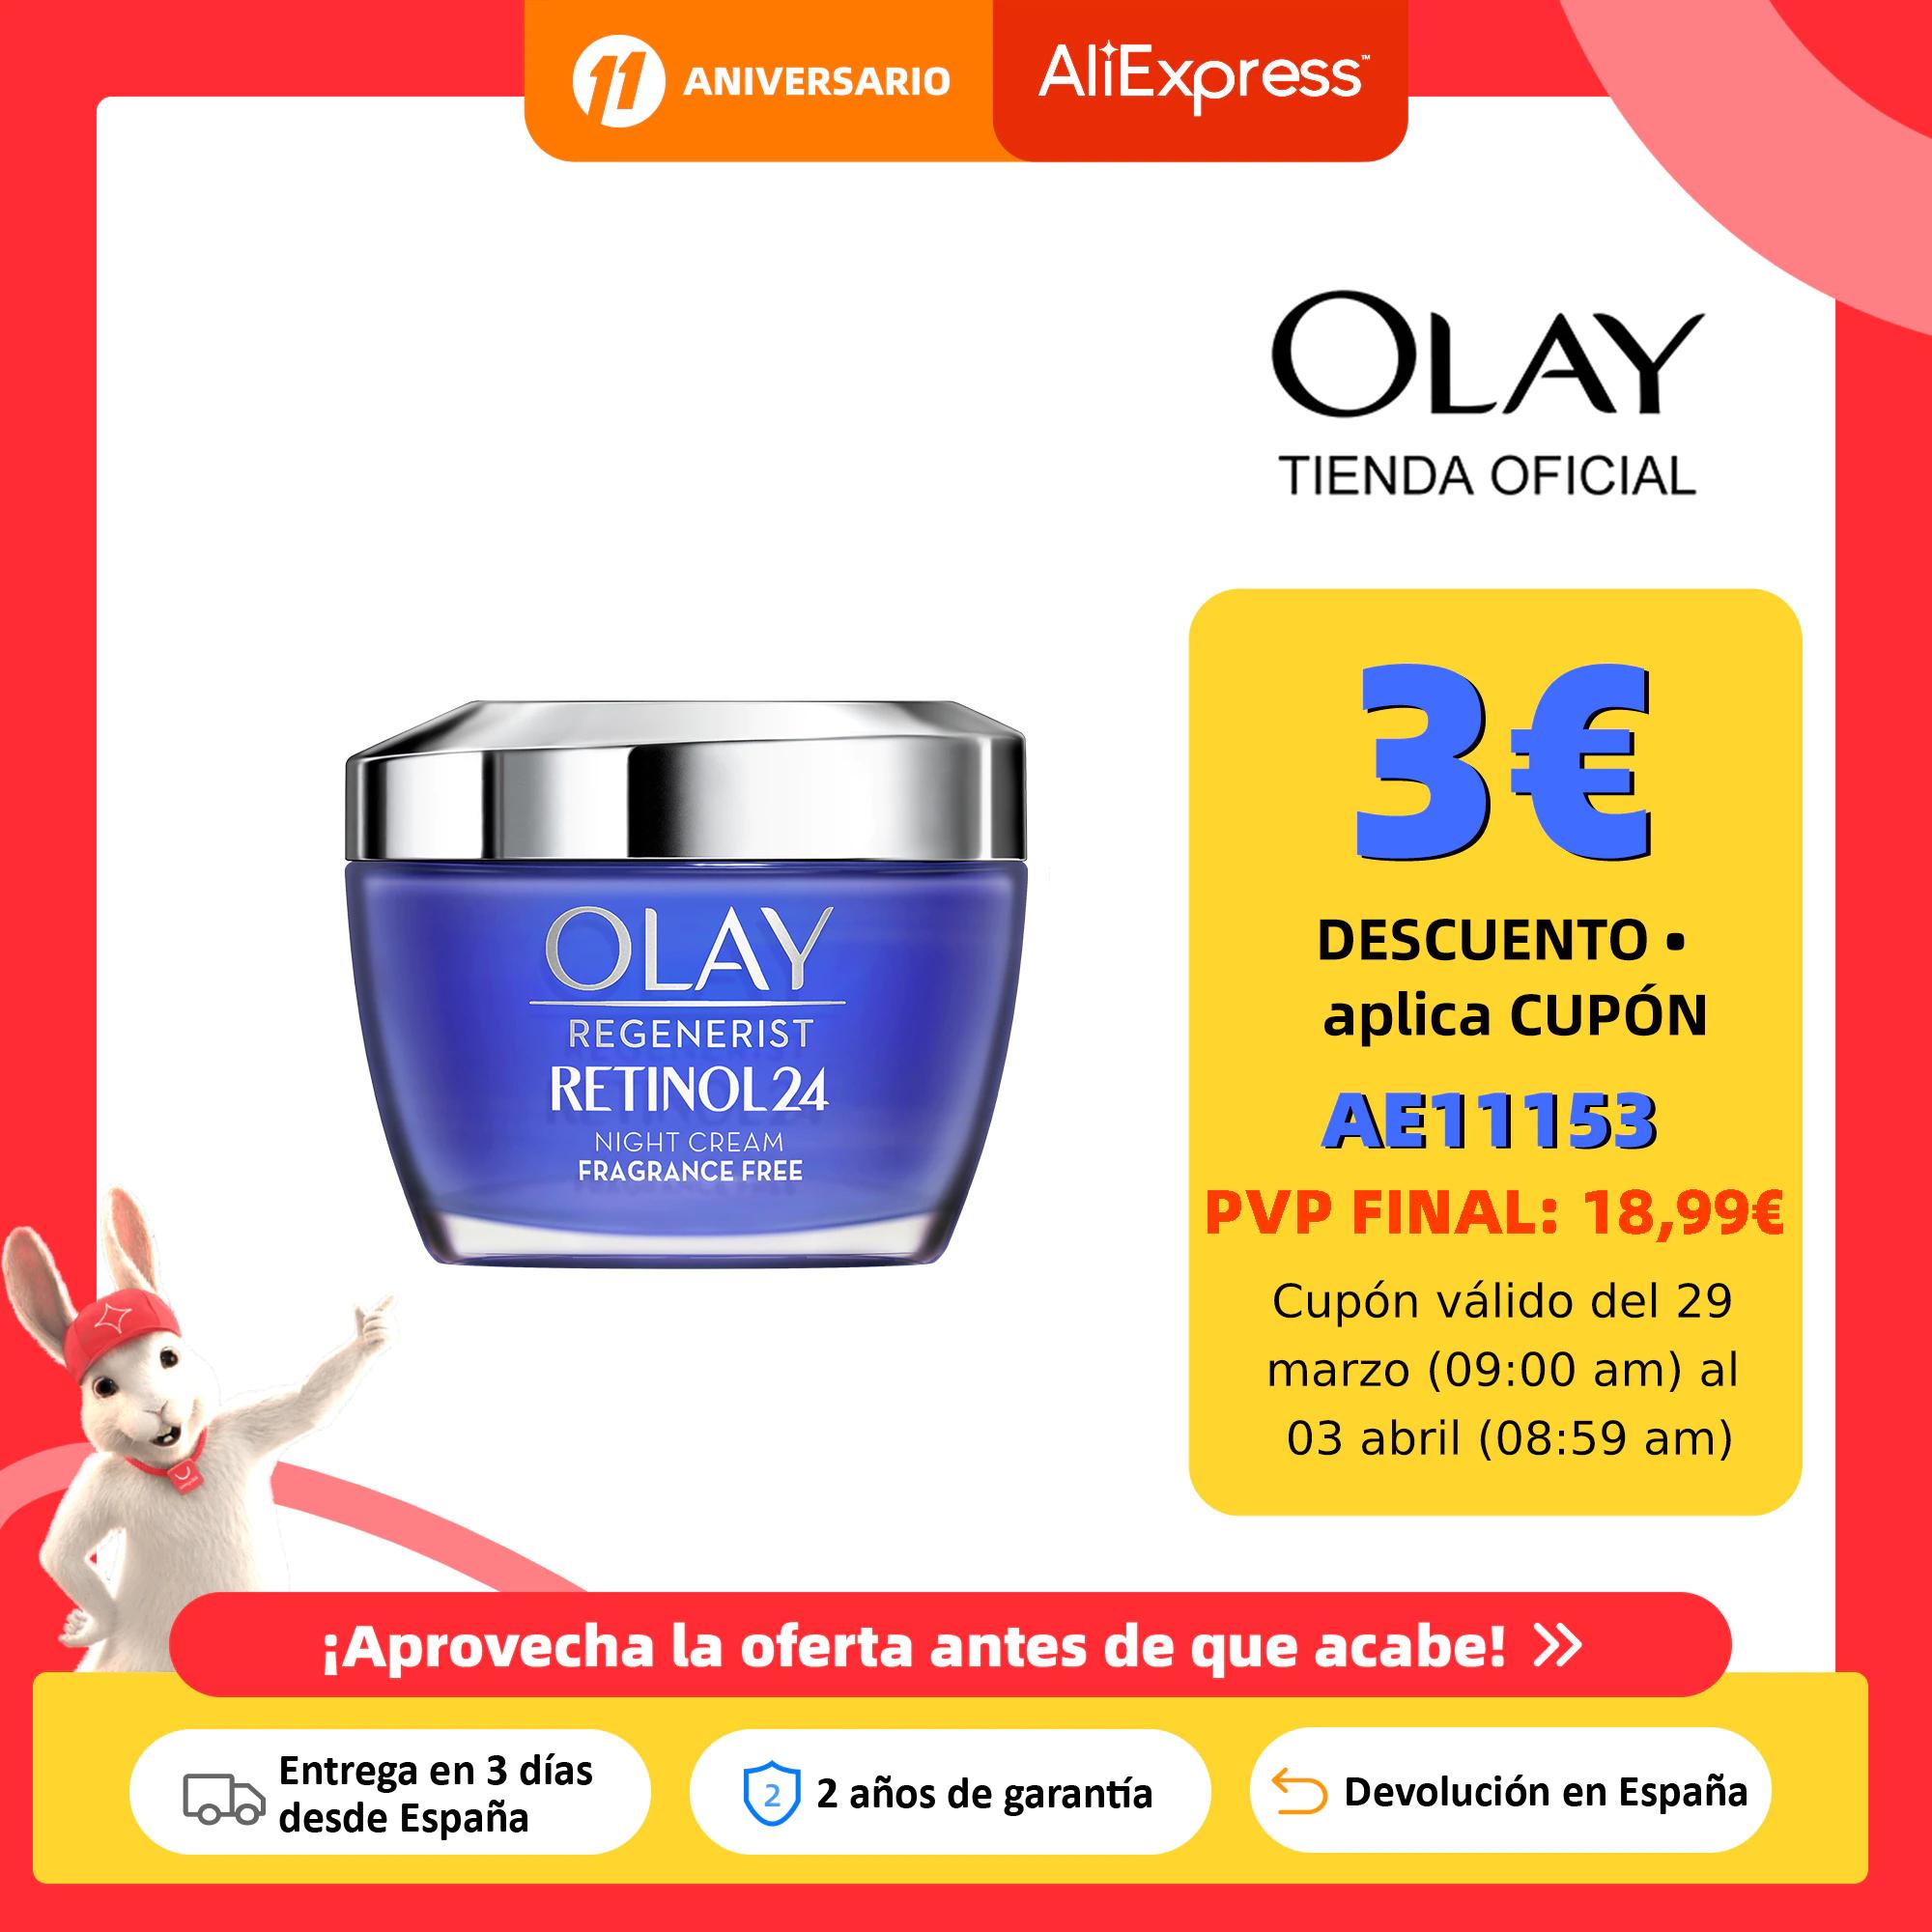 Olay Regenerist Retinol24, Plaza España